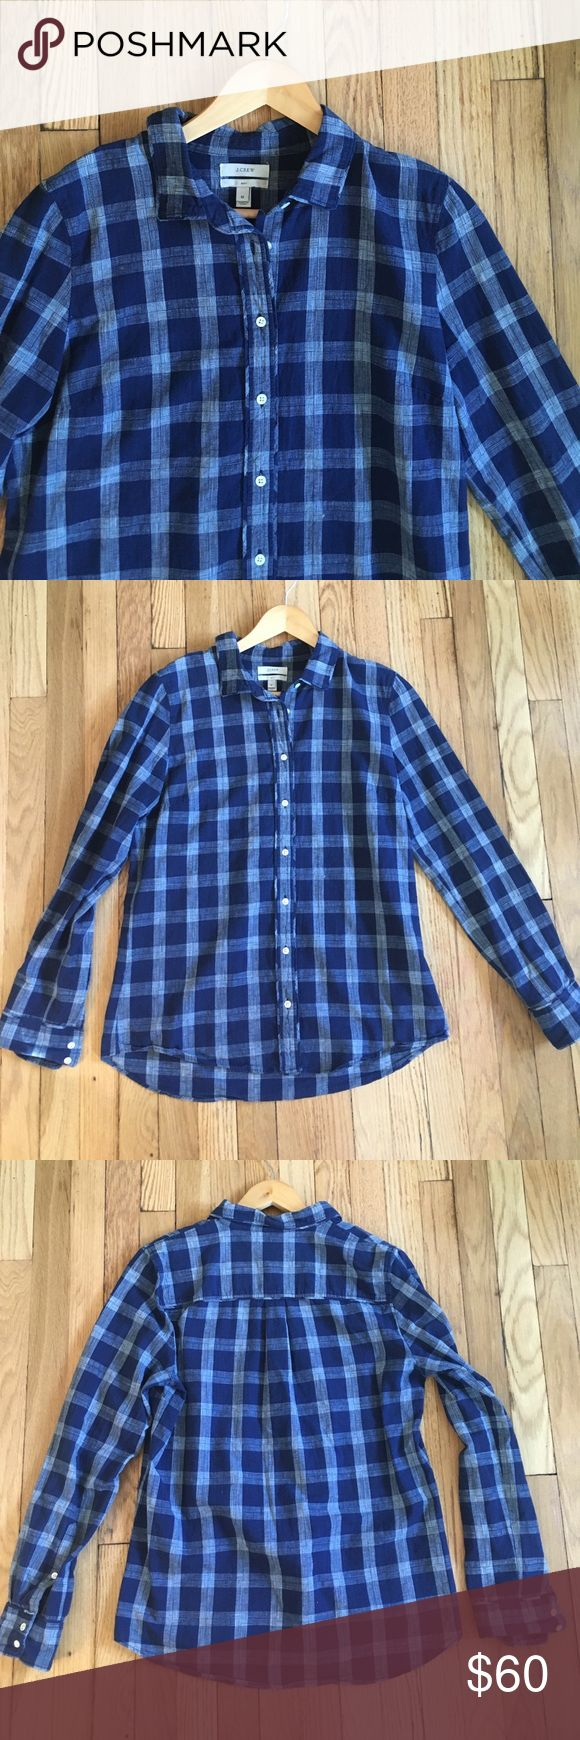 "J. Crew Boy Shirt Blue Hash Check Cotton Size 10 J. Crew Boy Shirt Blue Hash Check 100% Cotton. Button Front, long sleeve. Size 10, measures 20.5"" armpit to armpit, 26.5"" shoulder to hem, 25"" sleeve. Perfect condition. No trades; bundle discount available! J. Crew Tops Button Down Shirts"